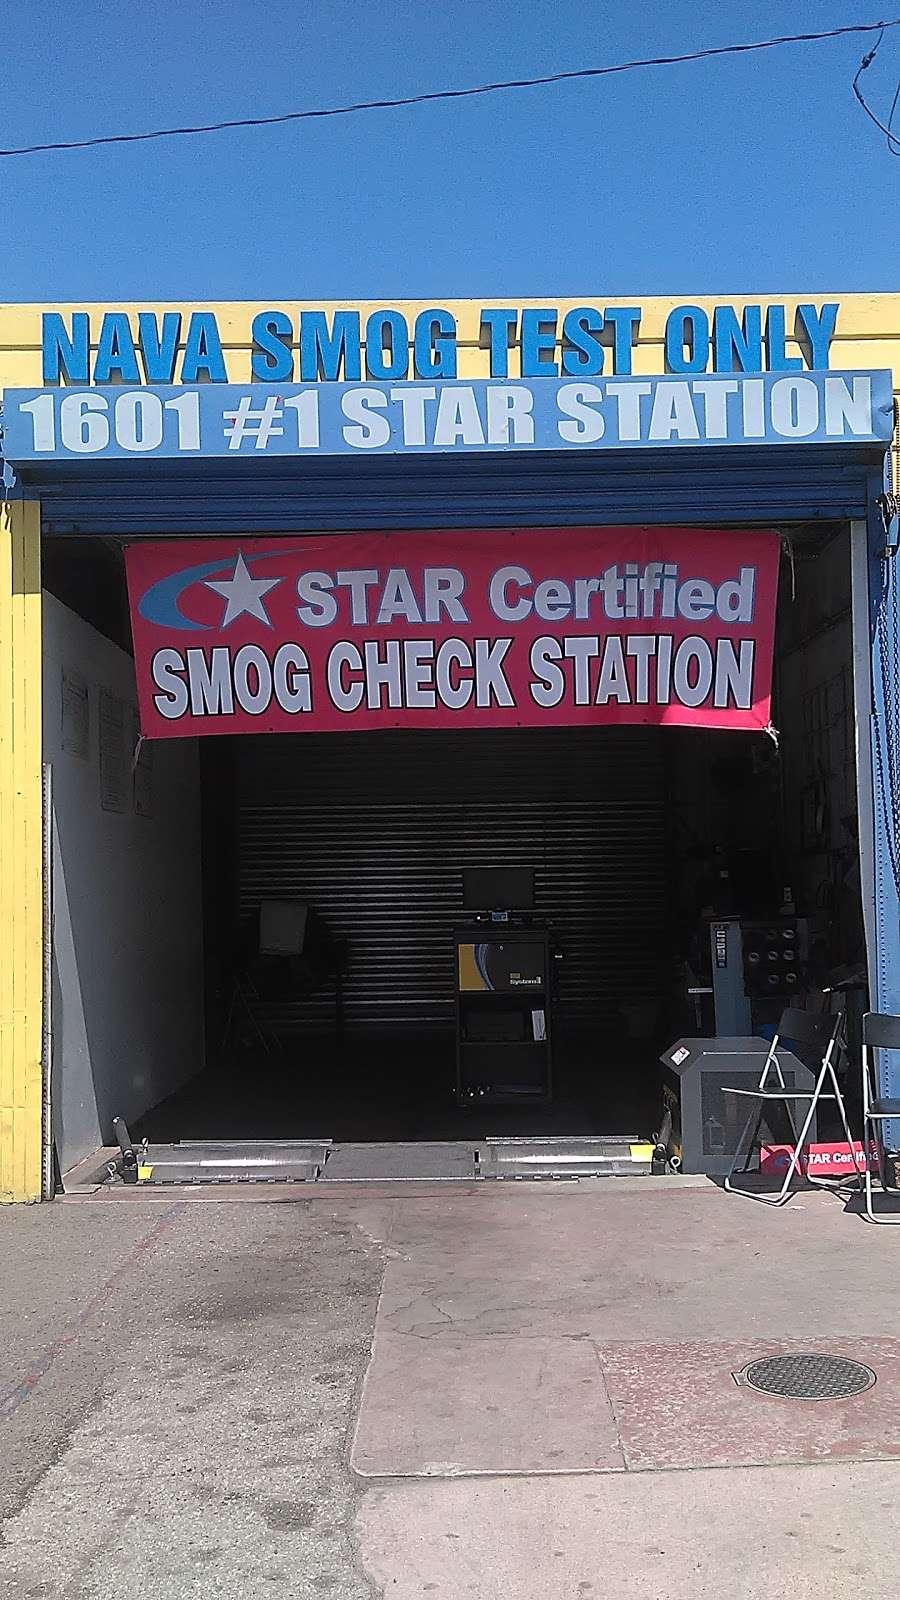 Nava Smog - car repair  | Photo 1 of 1 | Address: 1601 Pacific Coast Hwy #1, Long Beach, CA 90806, USA | Phone: (562) 591-6181